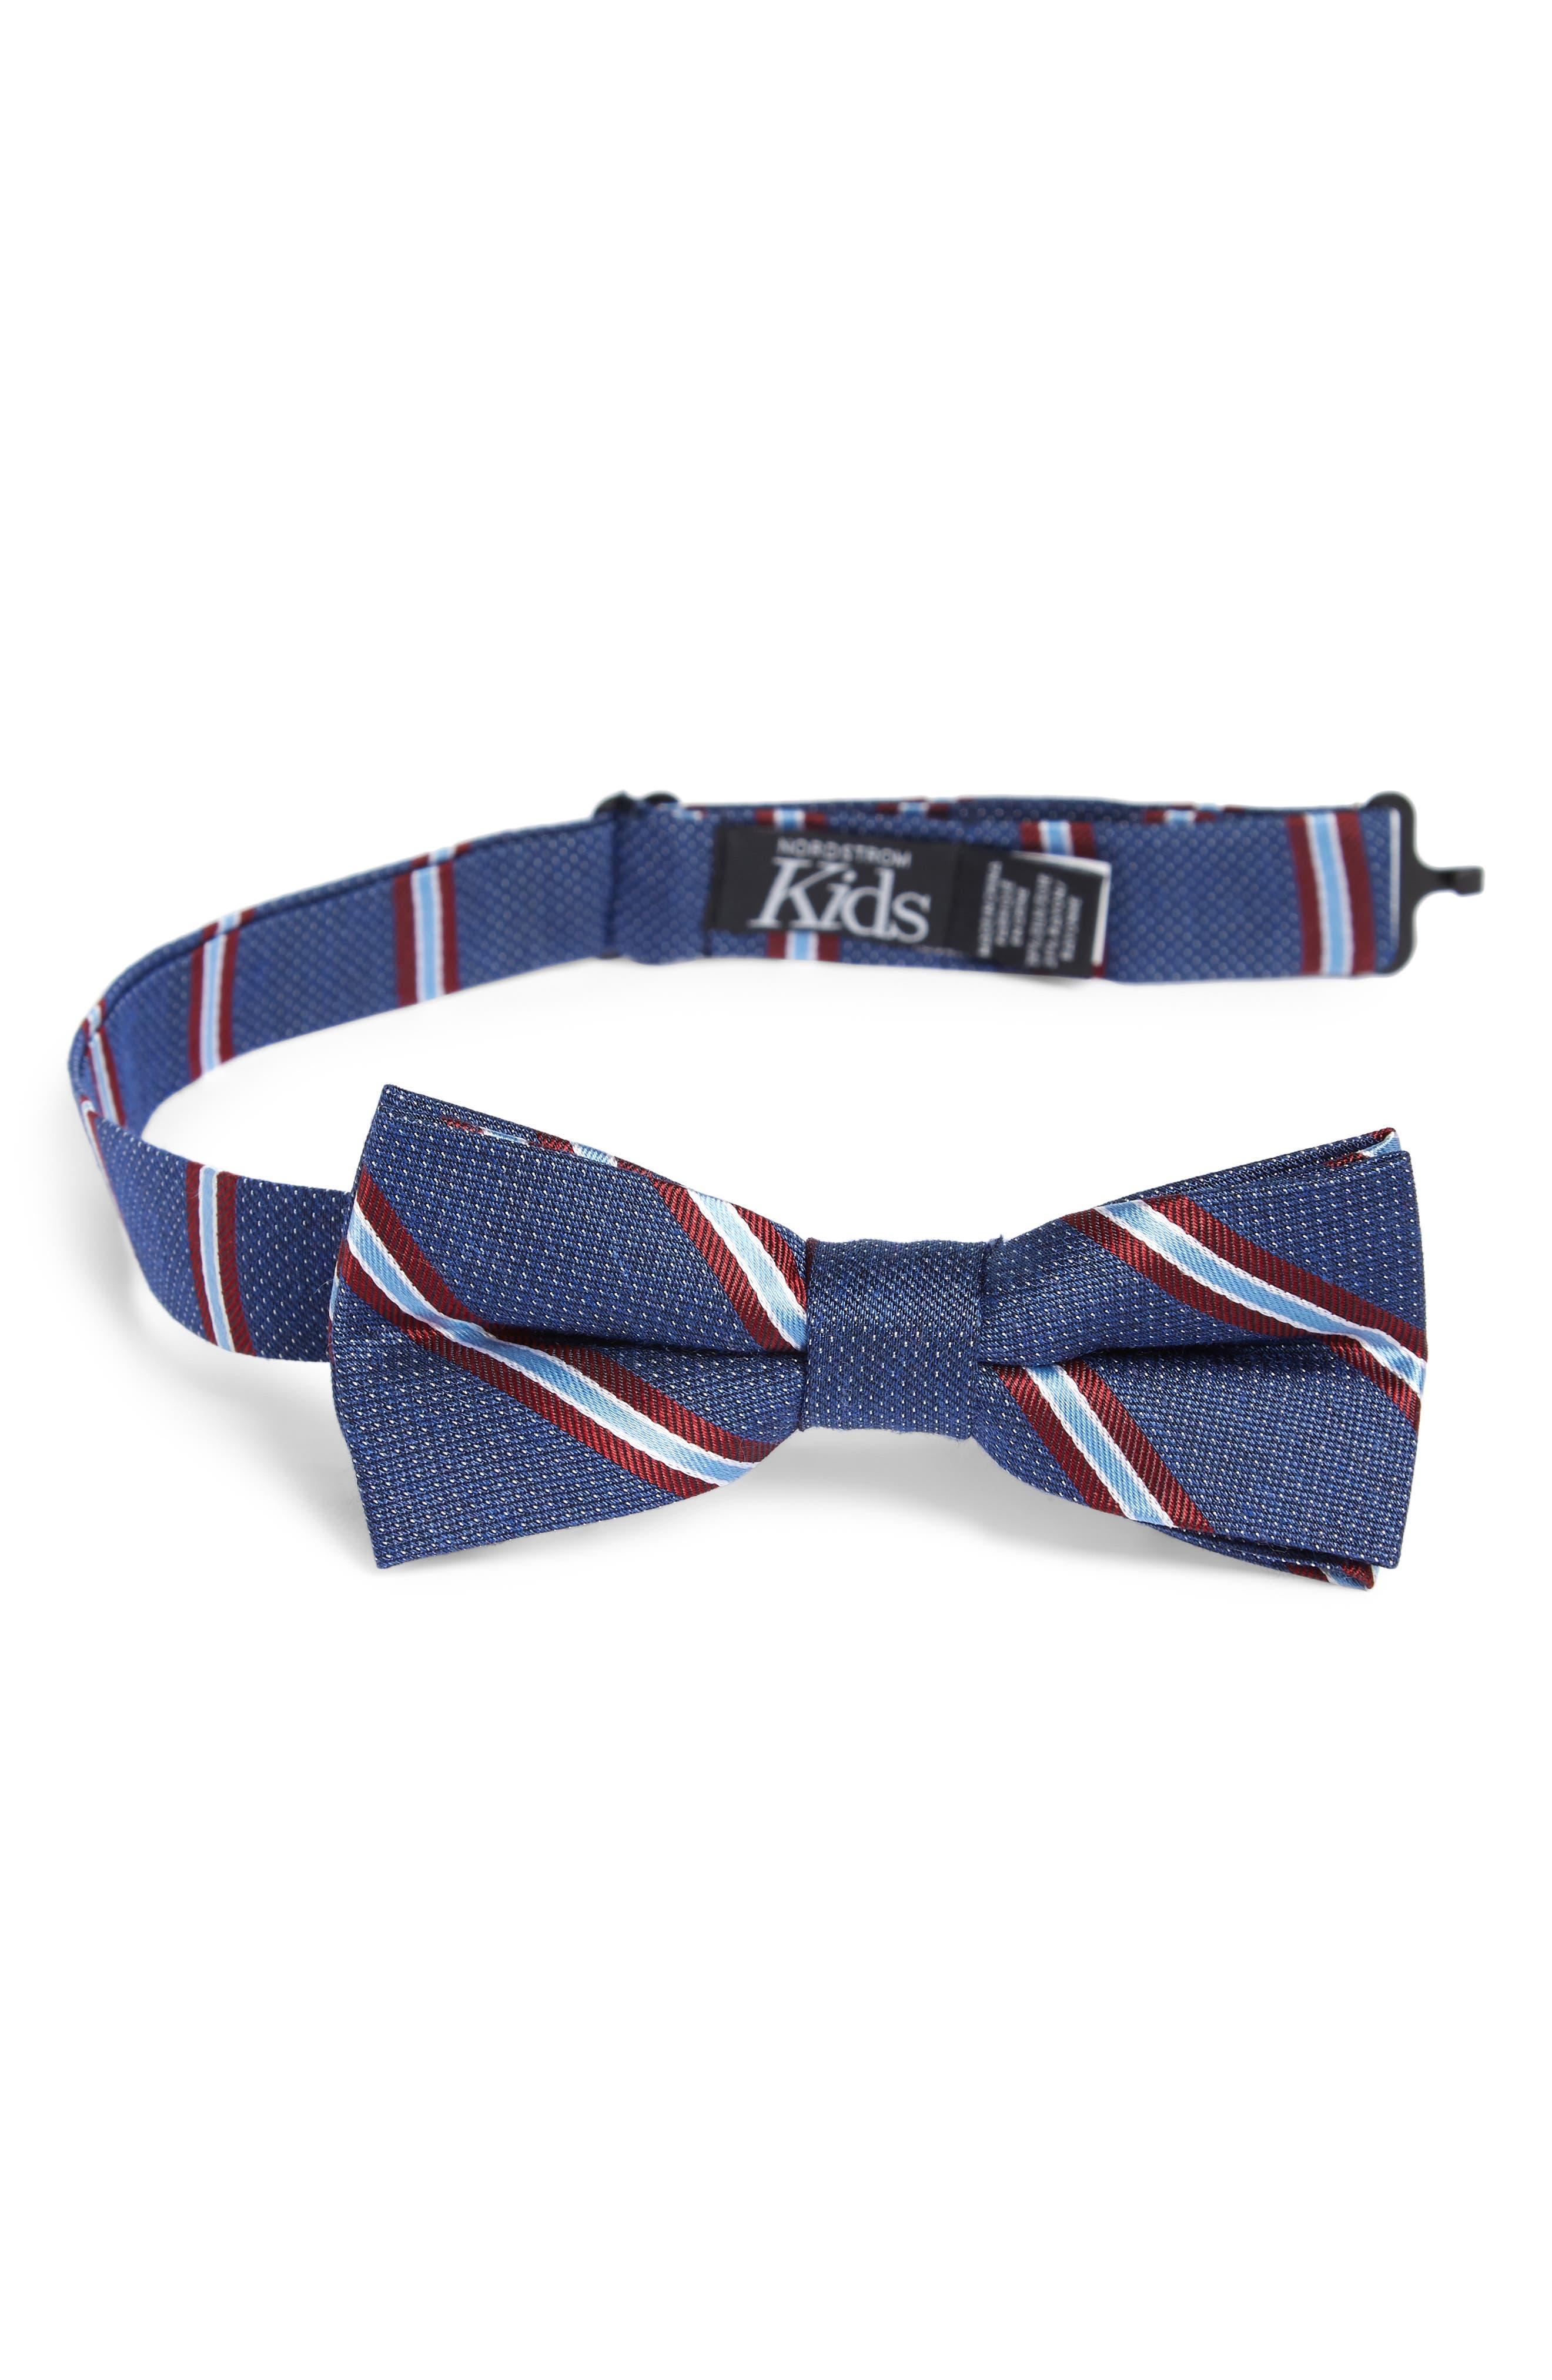 New Vintage Boys Clothing and Costumes Boys Nordstrom Stripe Silk Blend Bow Tie $22.00 AT vintagedancer.com